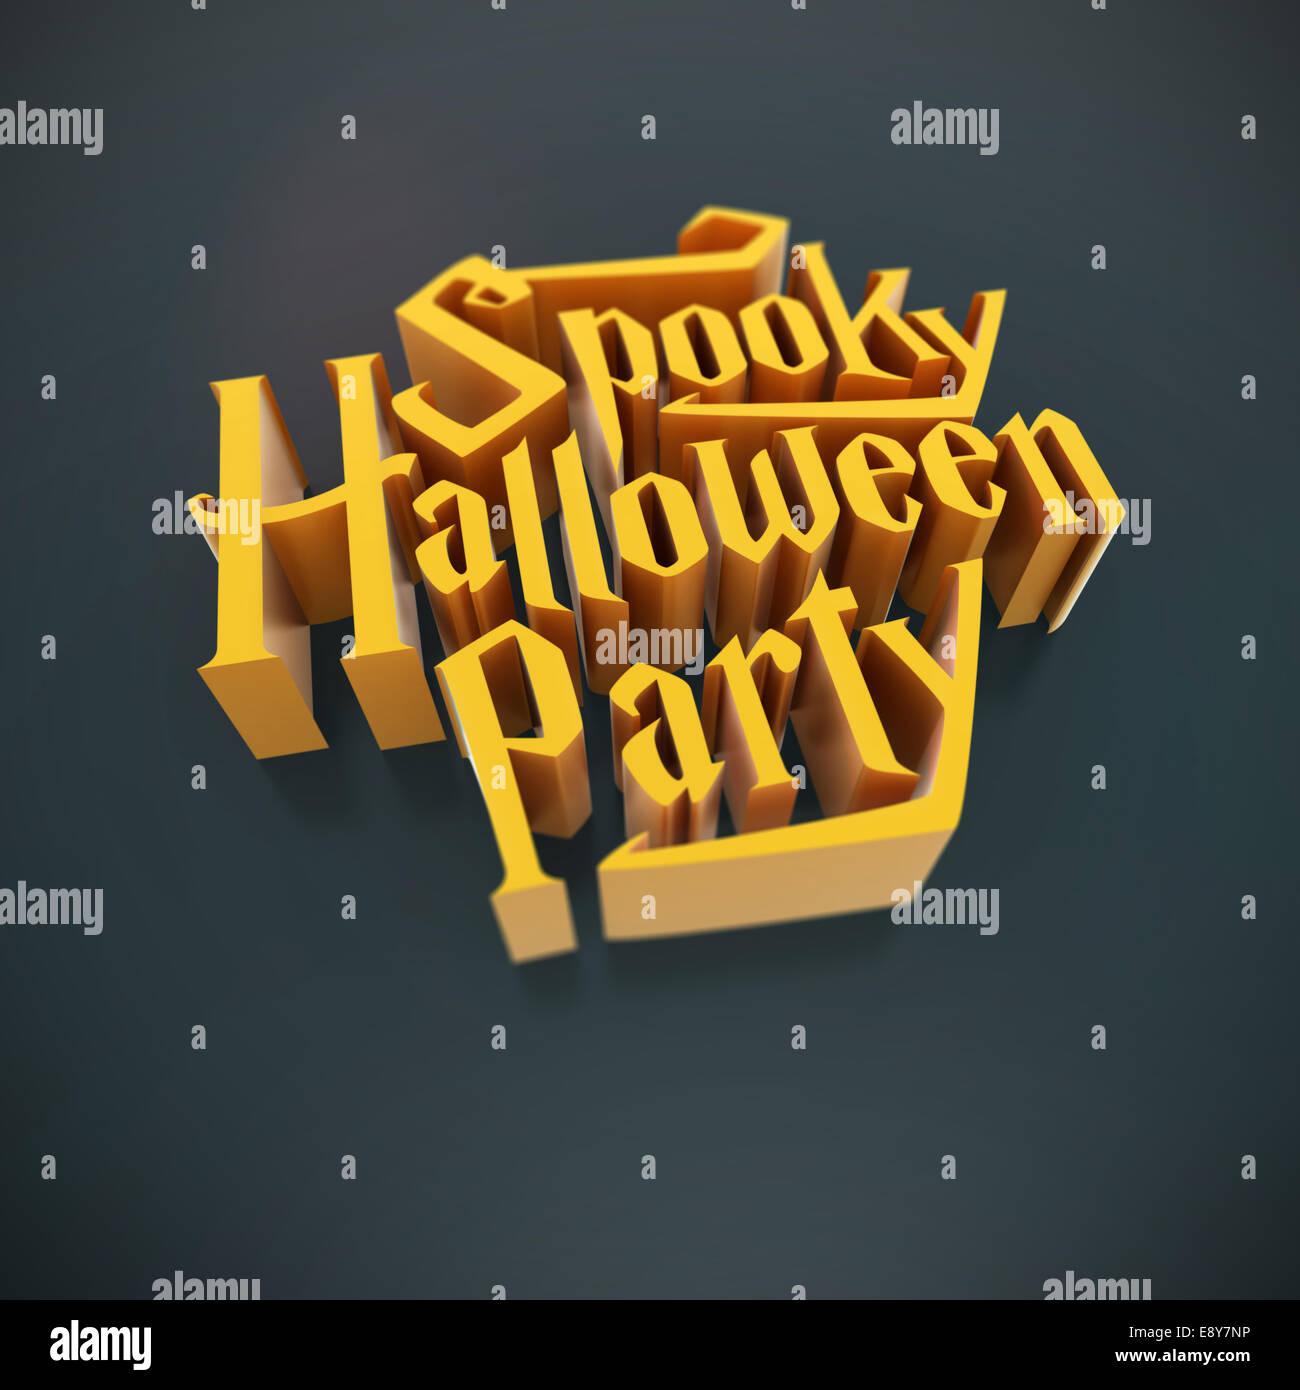 Spooky Halloween Party Naranja Calabaza Letras 3d Para Poster